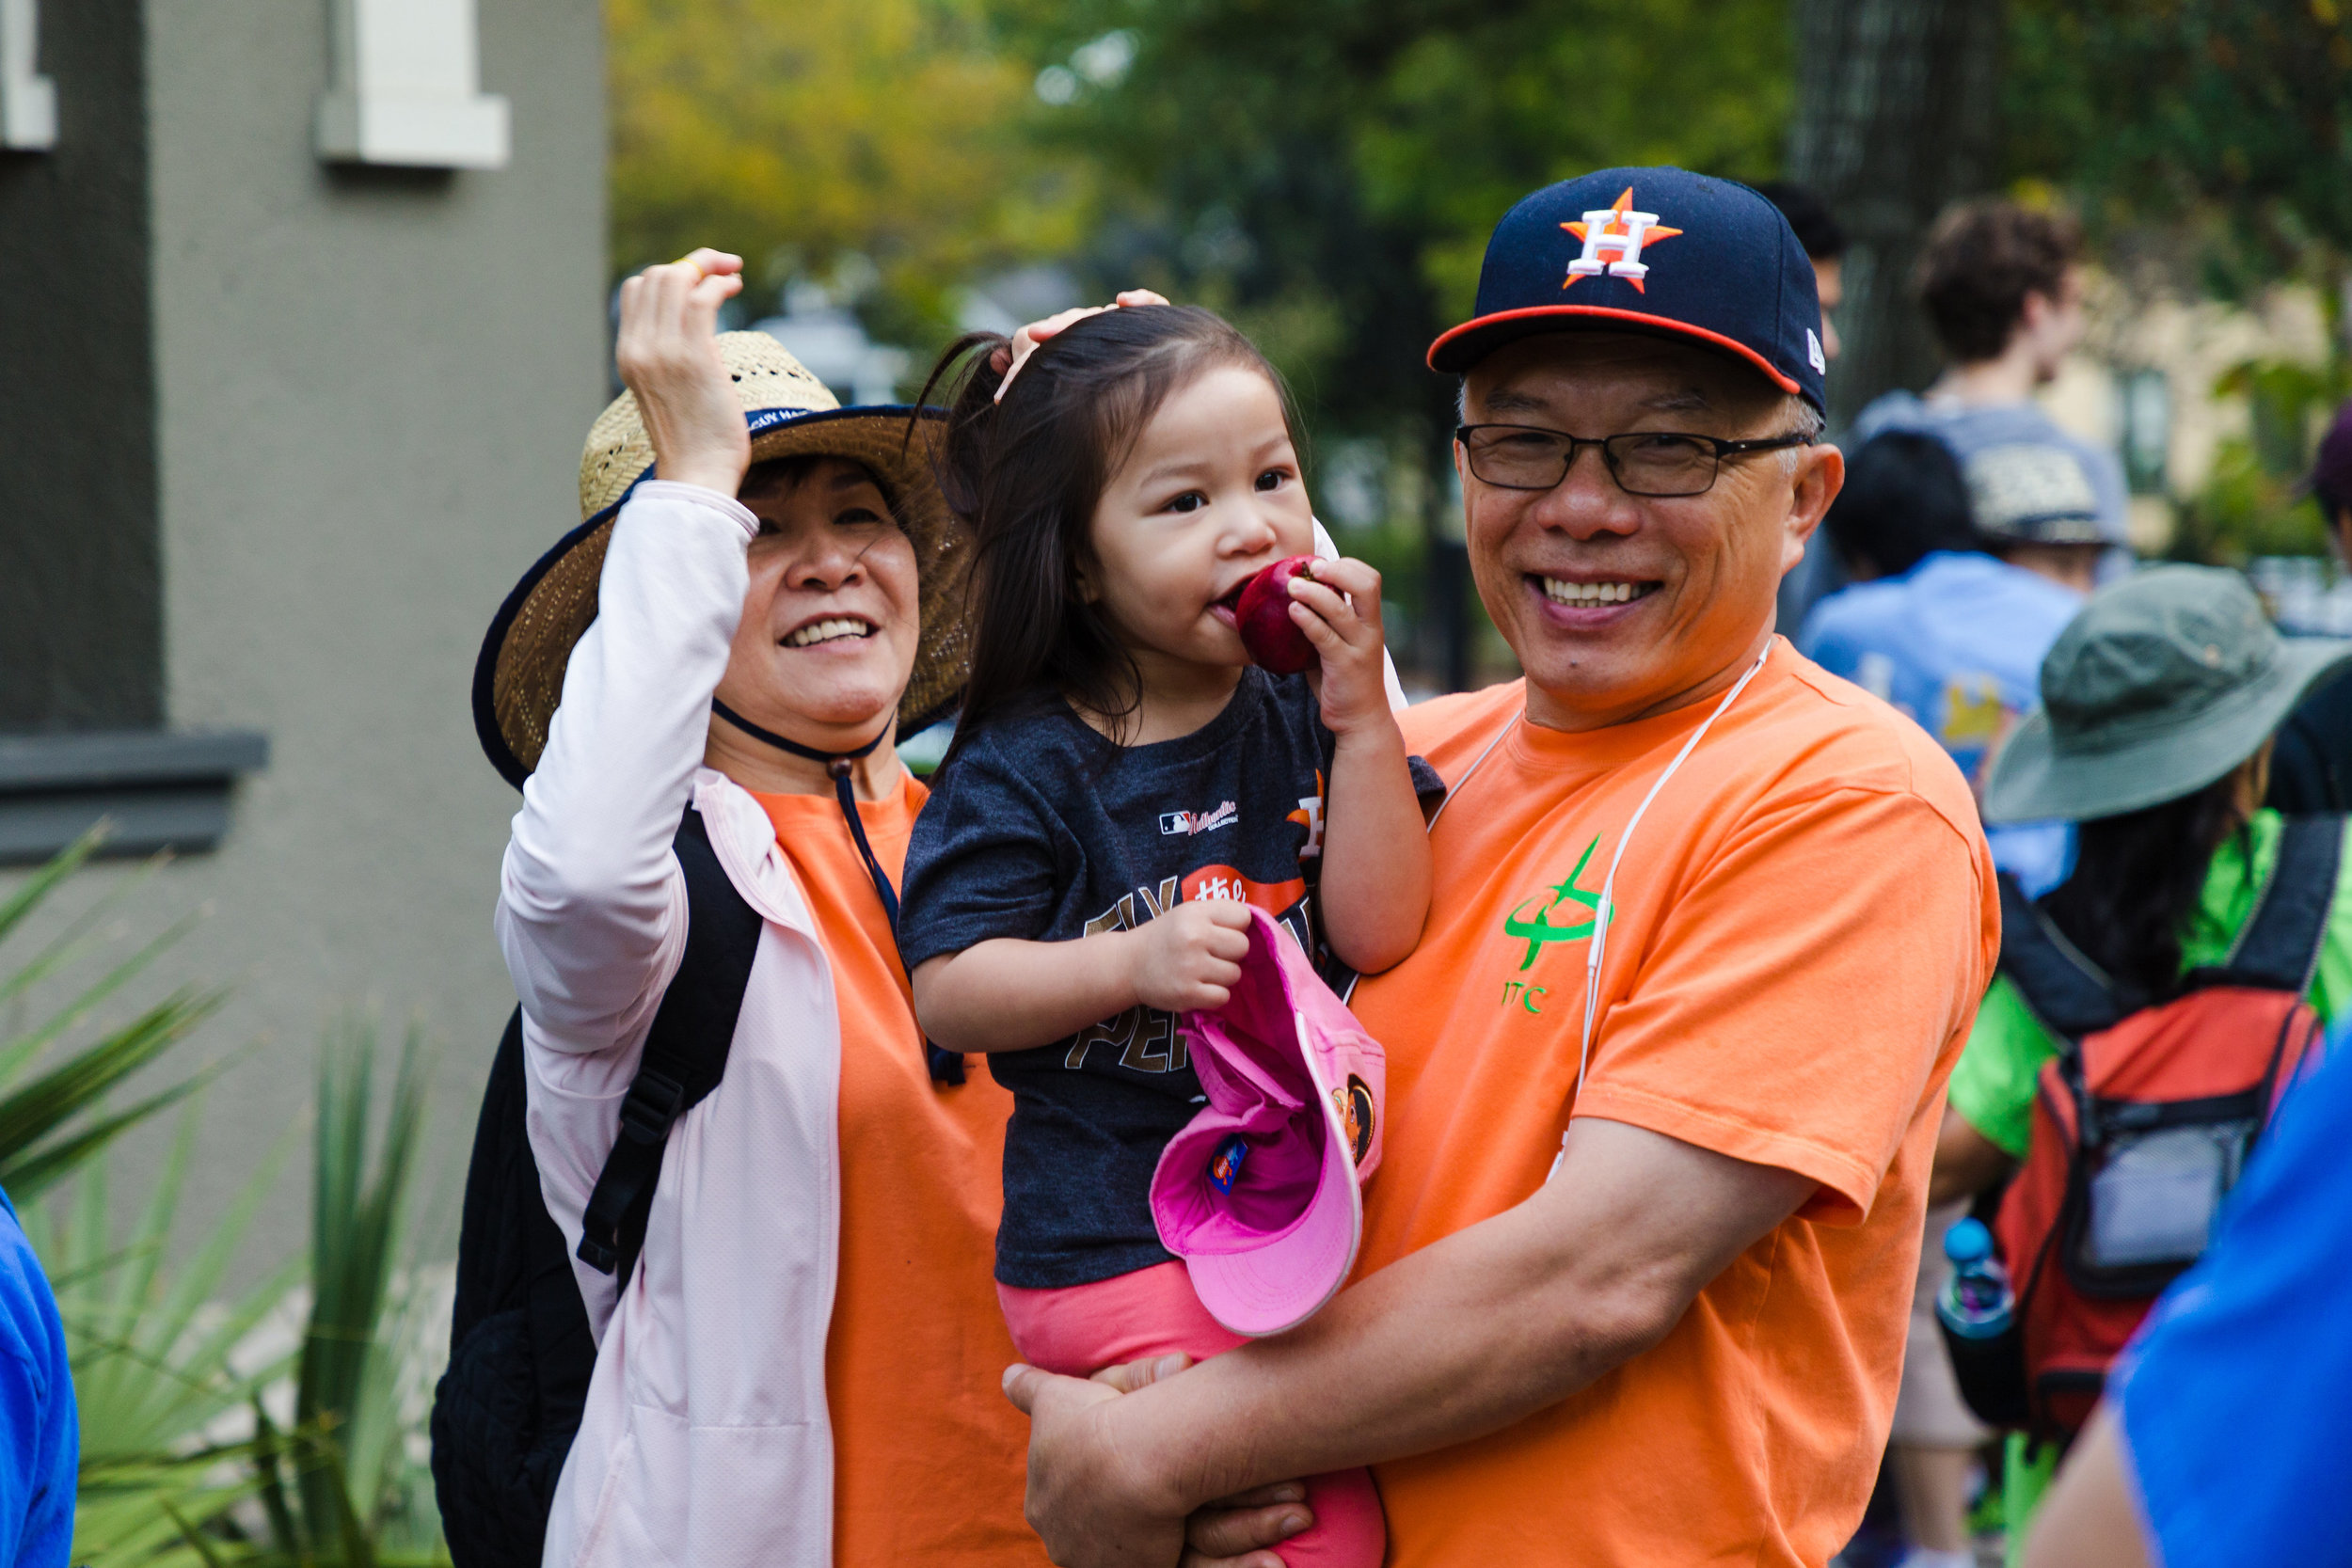 Bhikkhu-Bodhi-Global-Relief-Houston-Zen-Walk-1.jpg